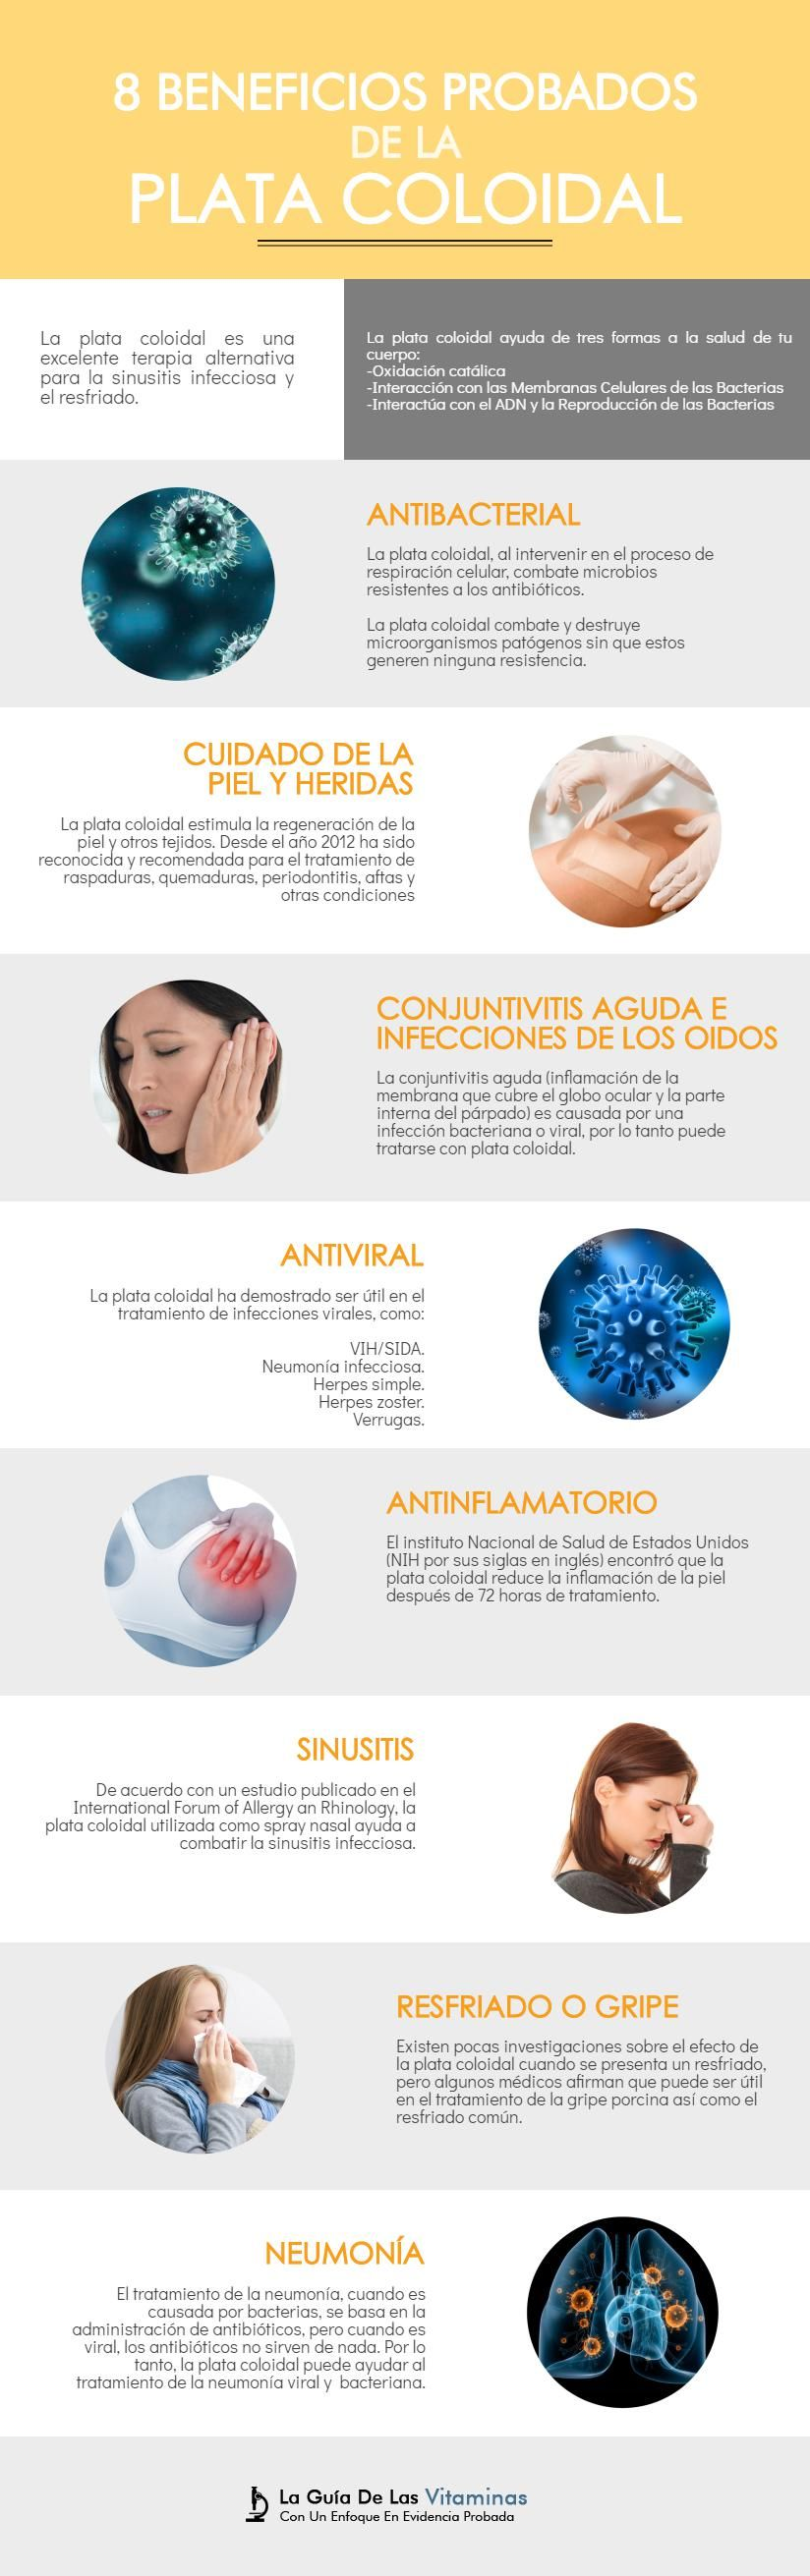 roxy fogyás efectos secundarios)